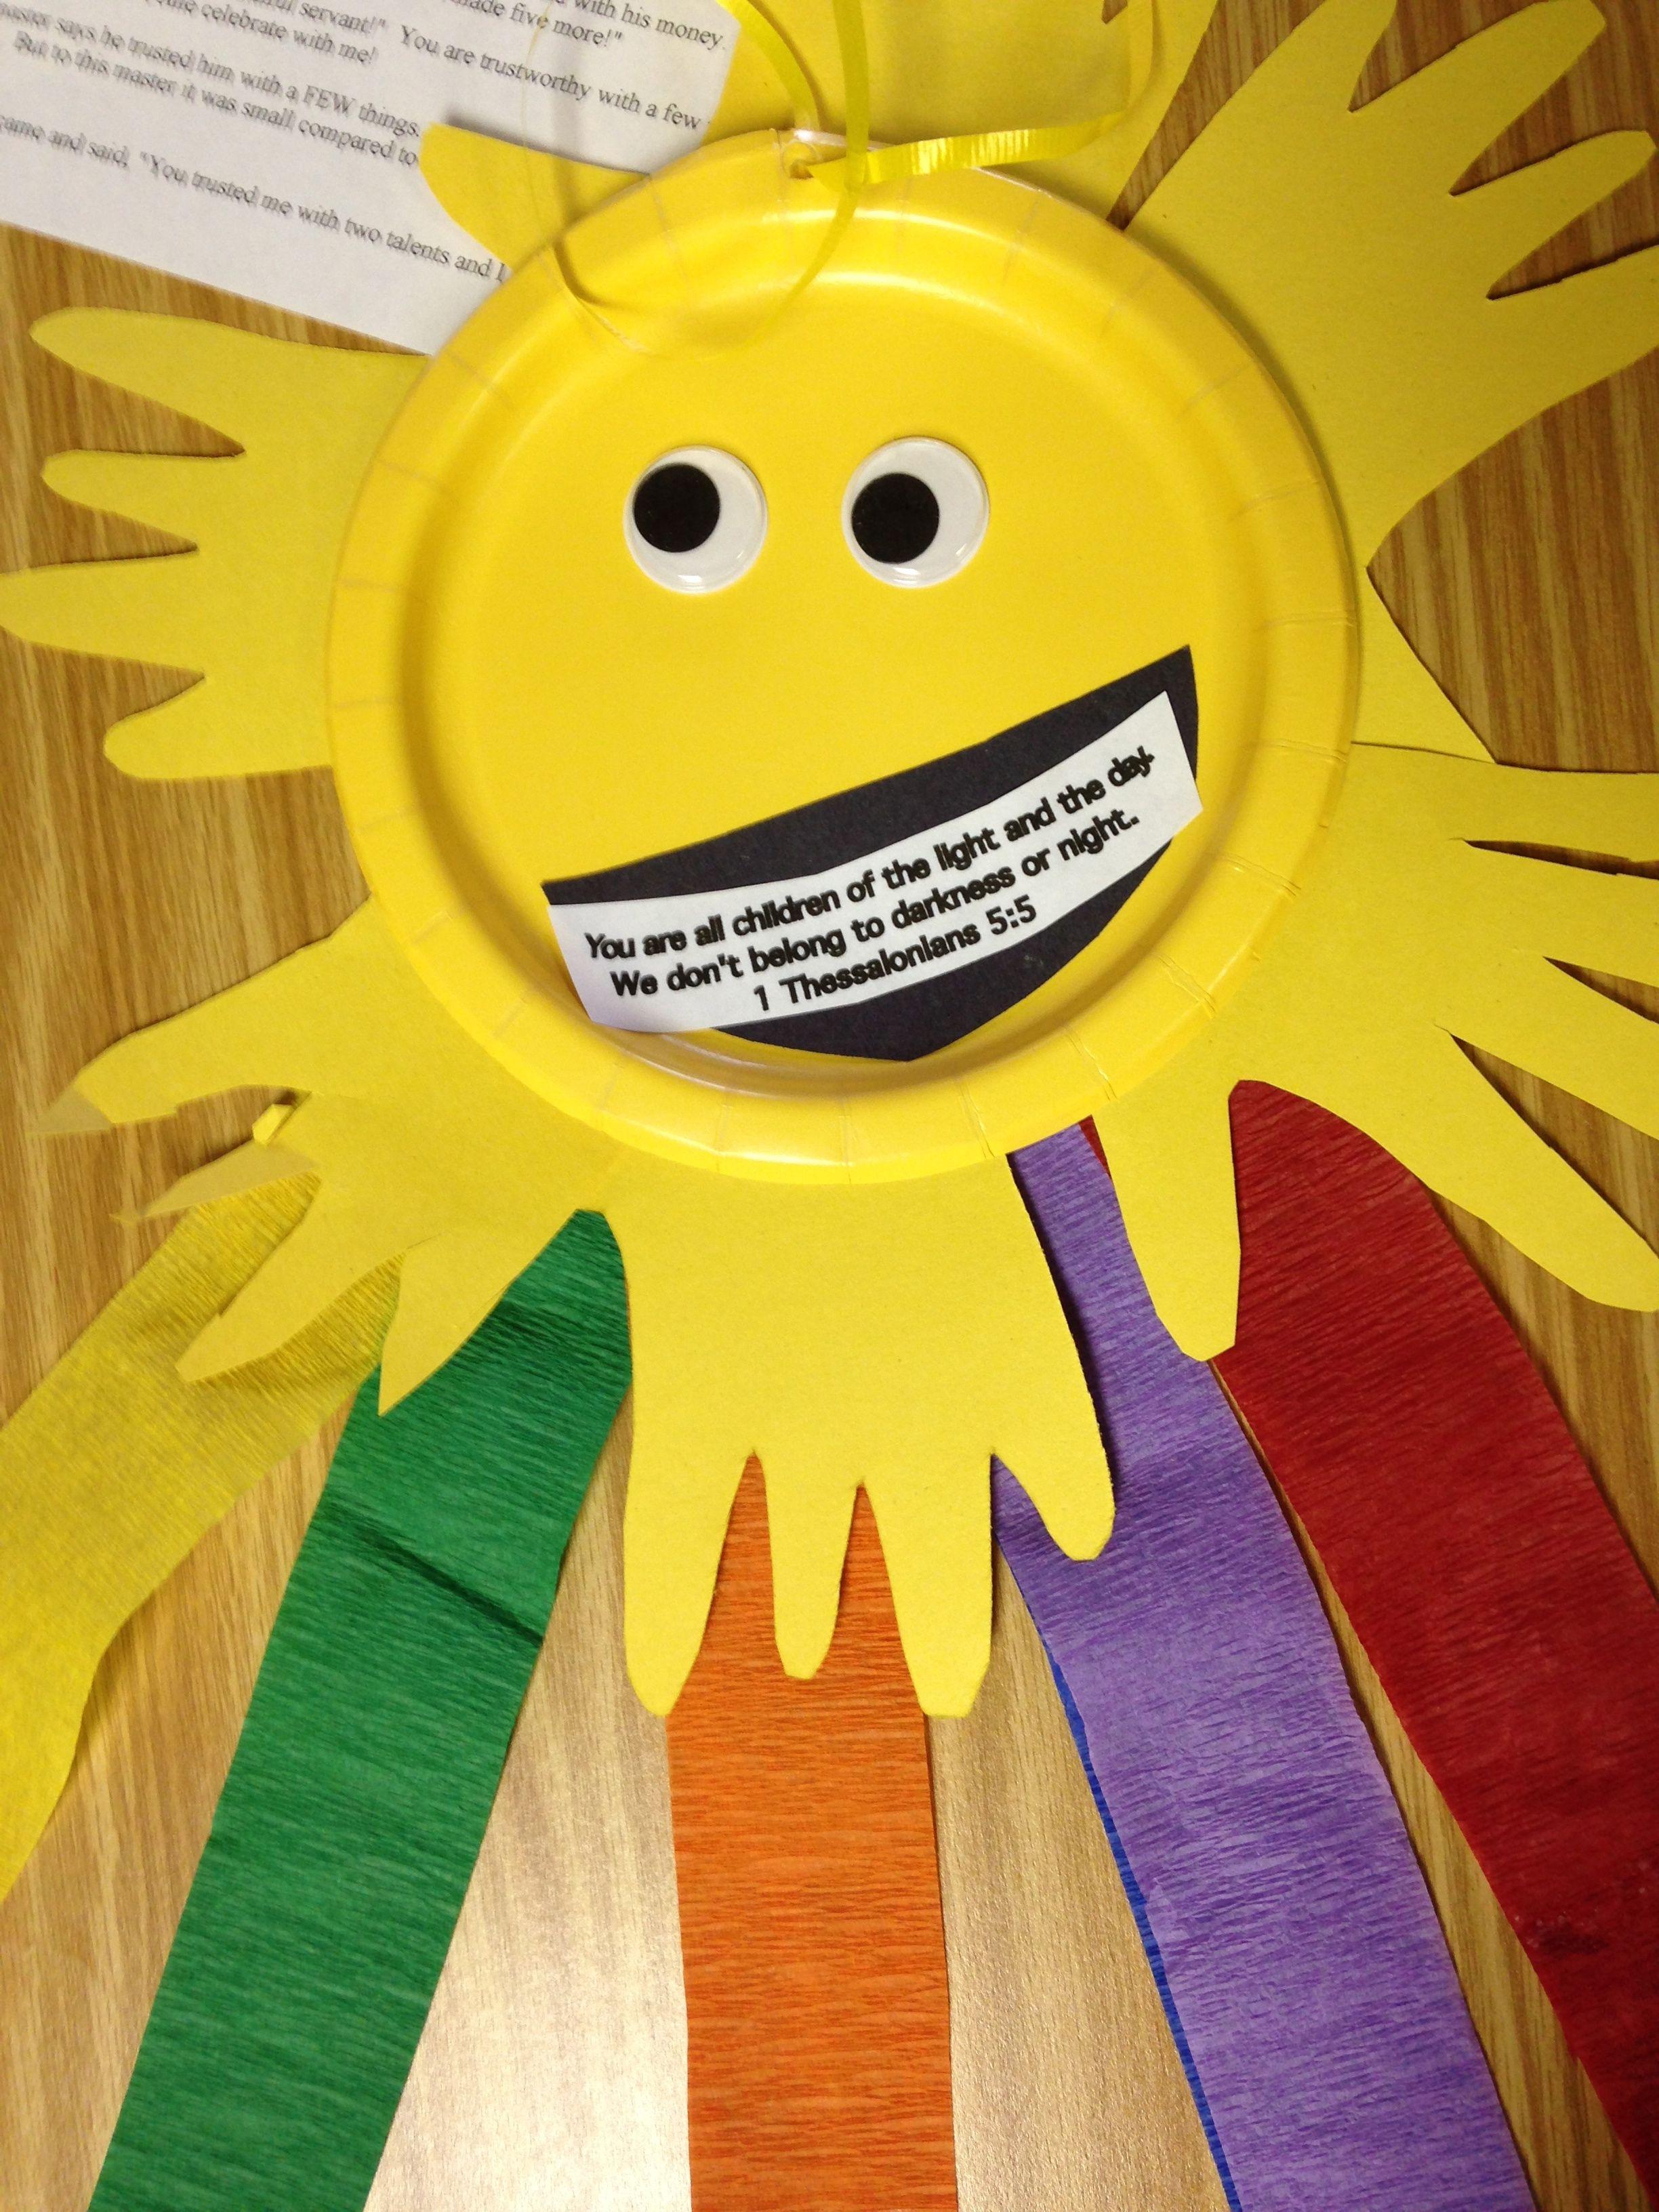 1 thessalonians 5 5 craft sunday crafts pinterest